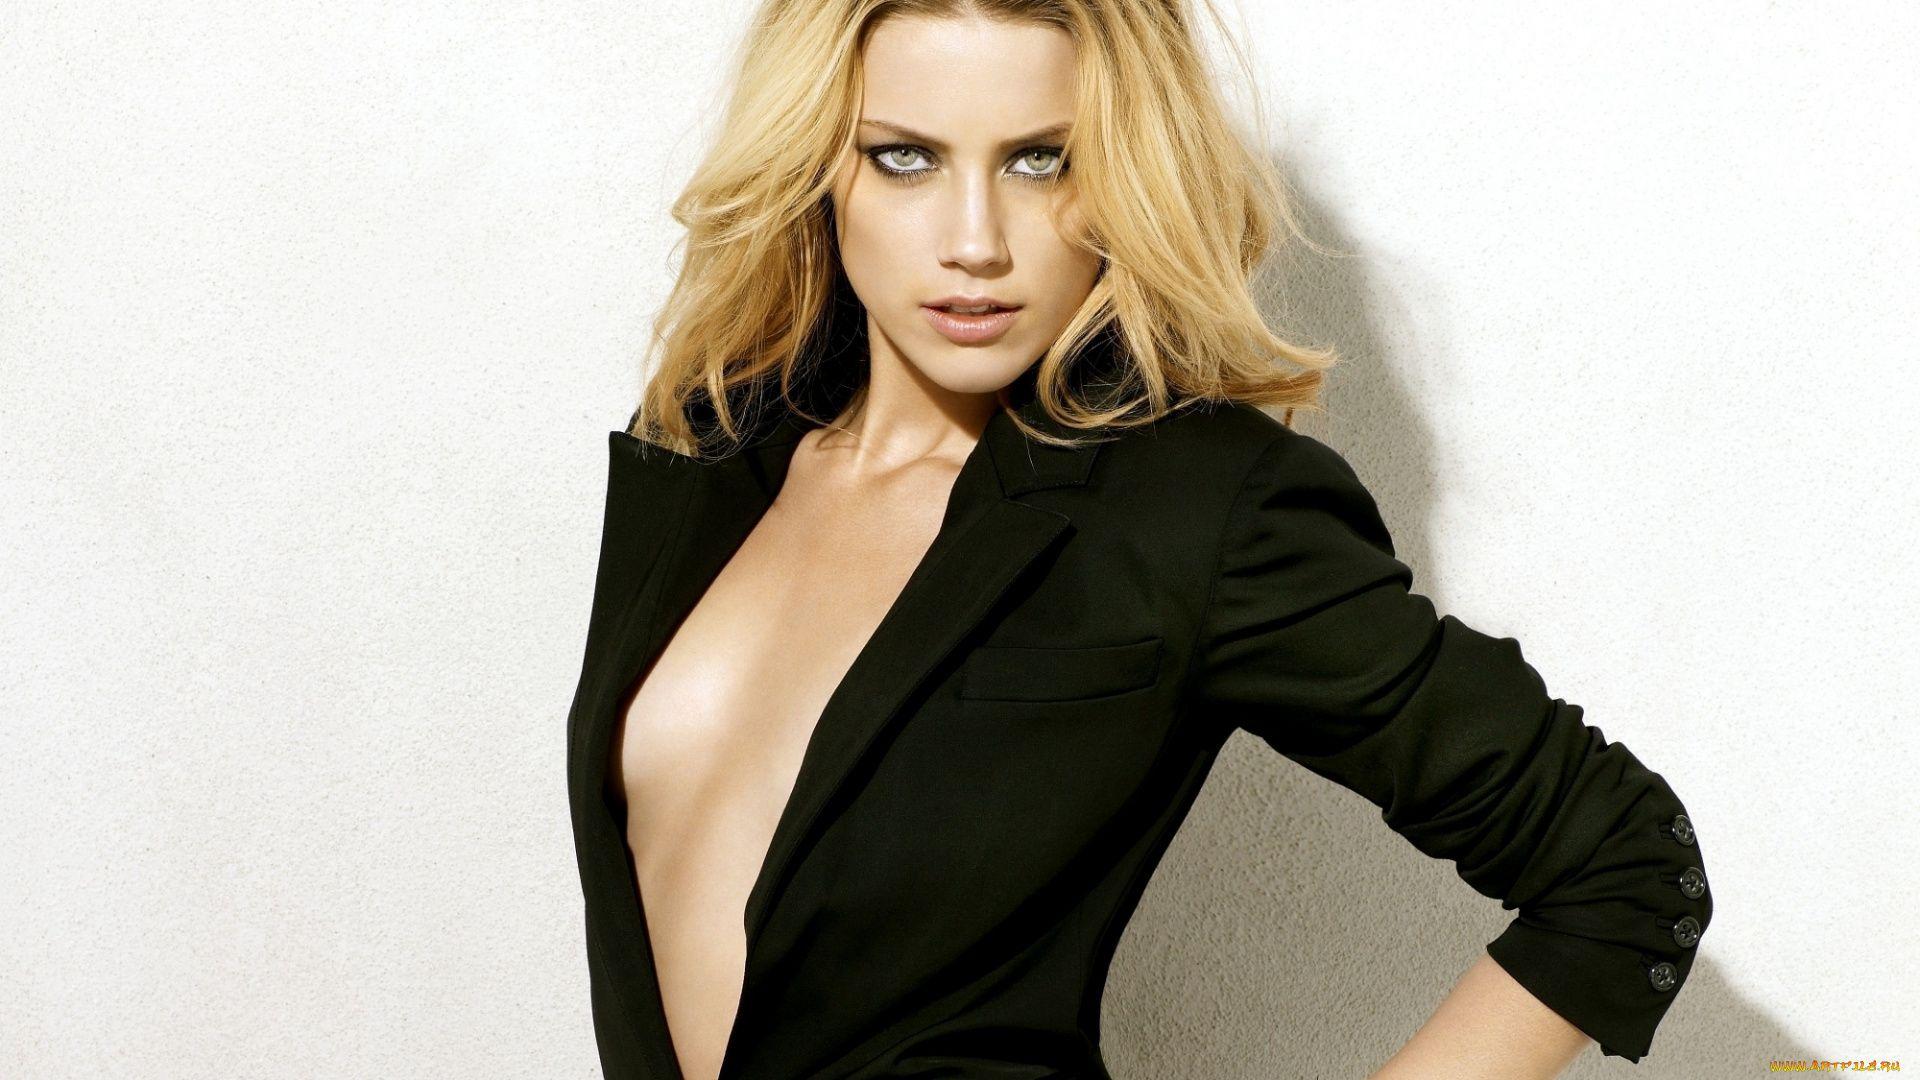 Amber Heard Photo Hot